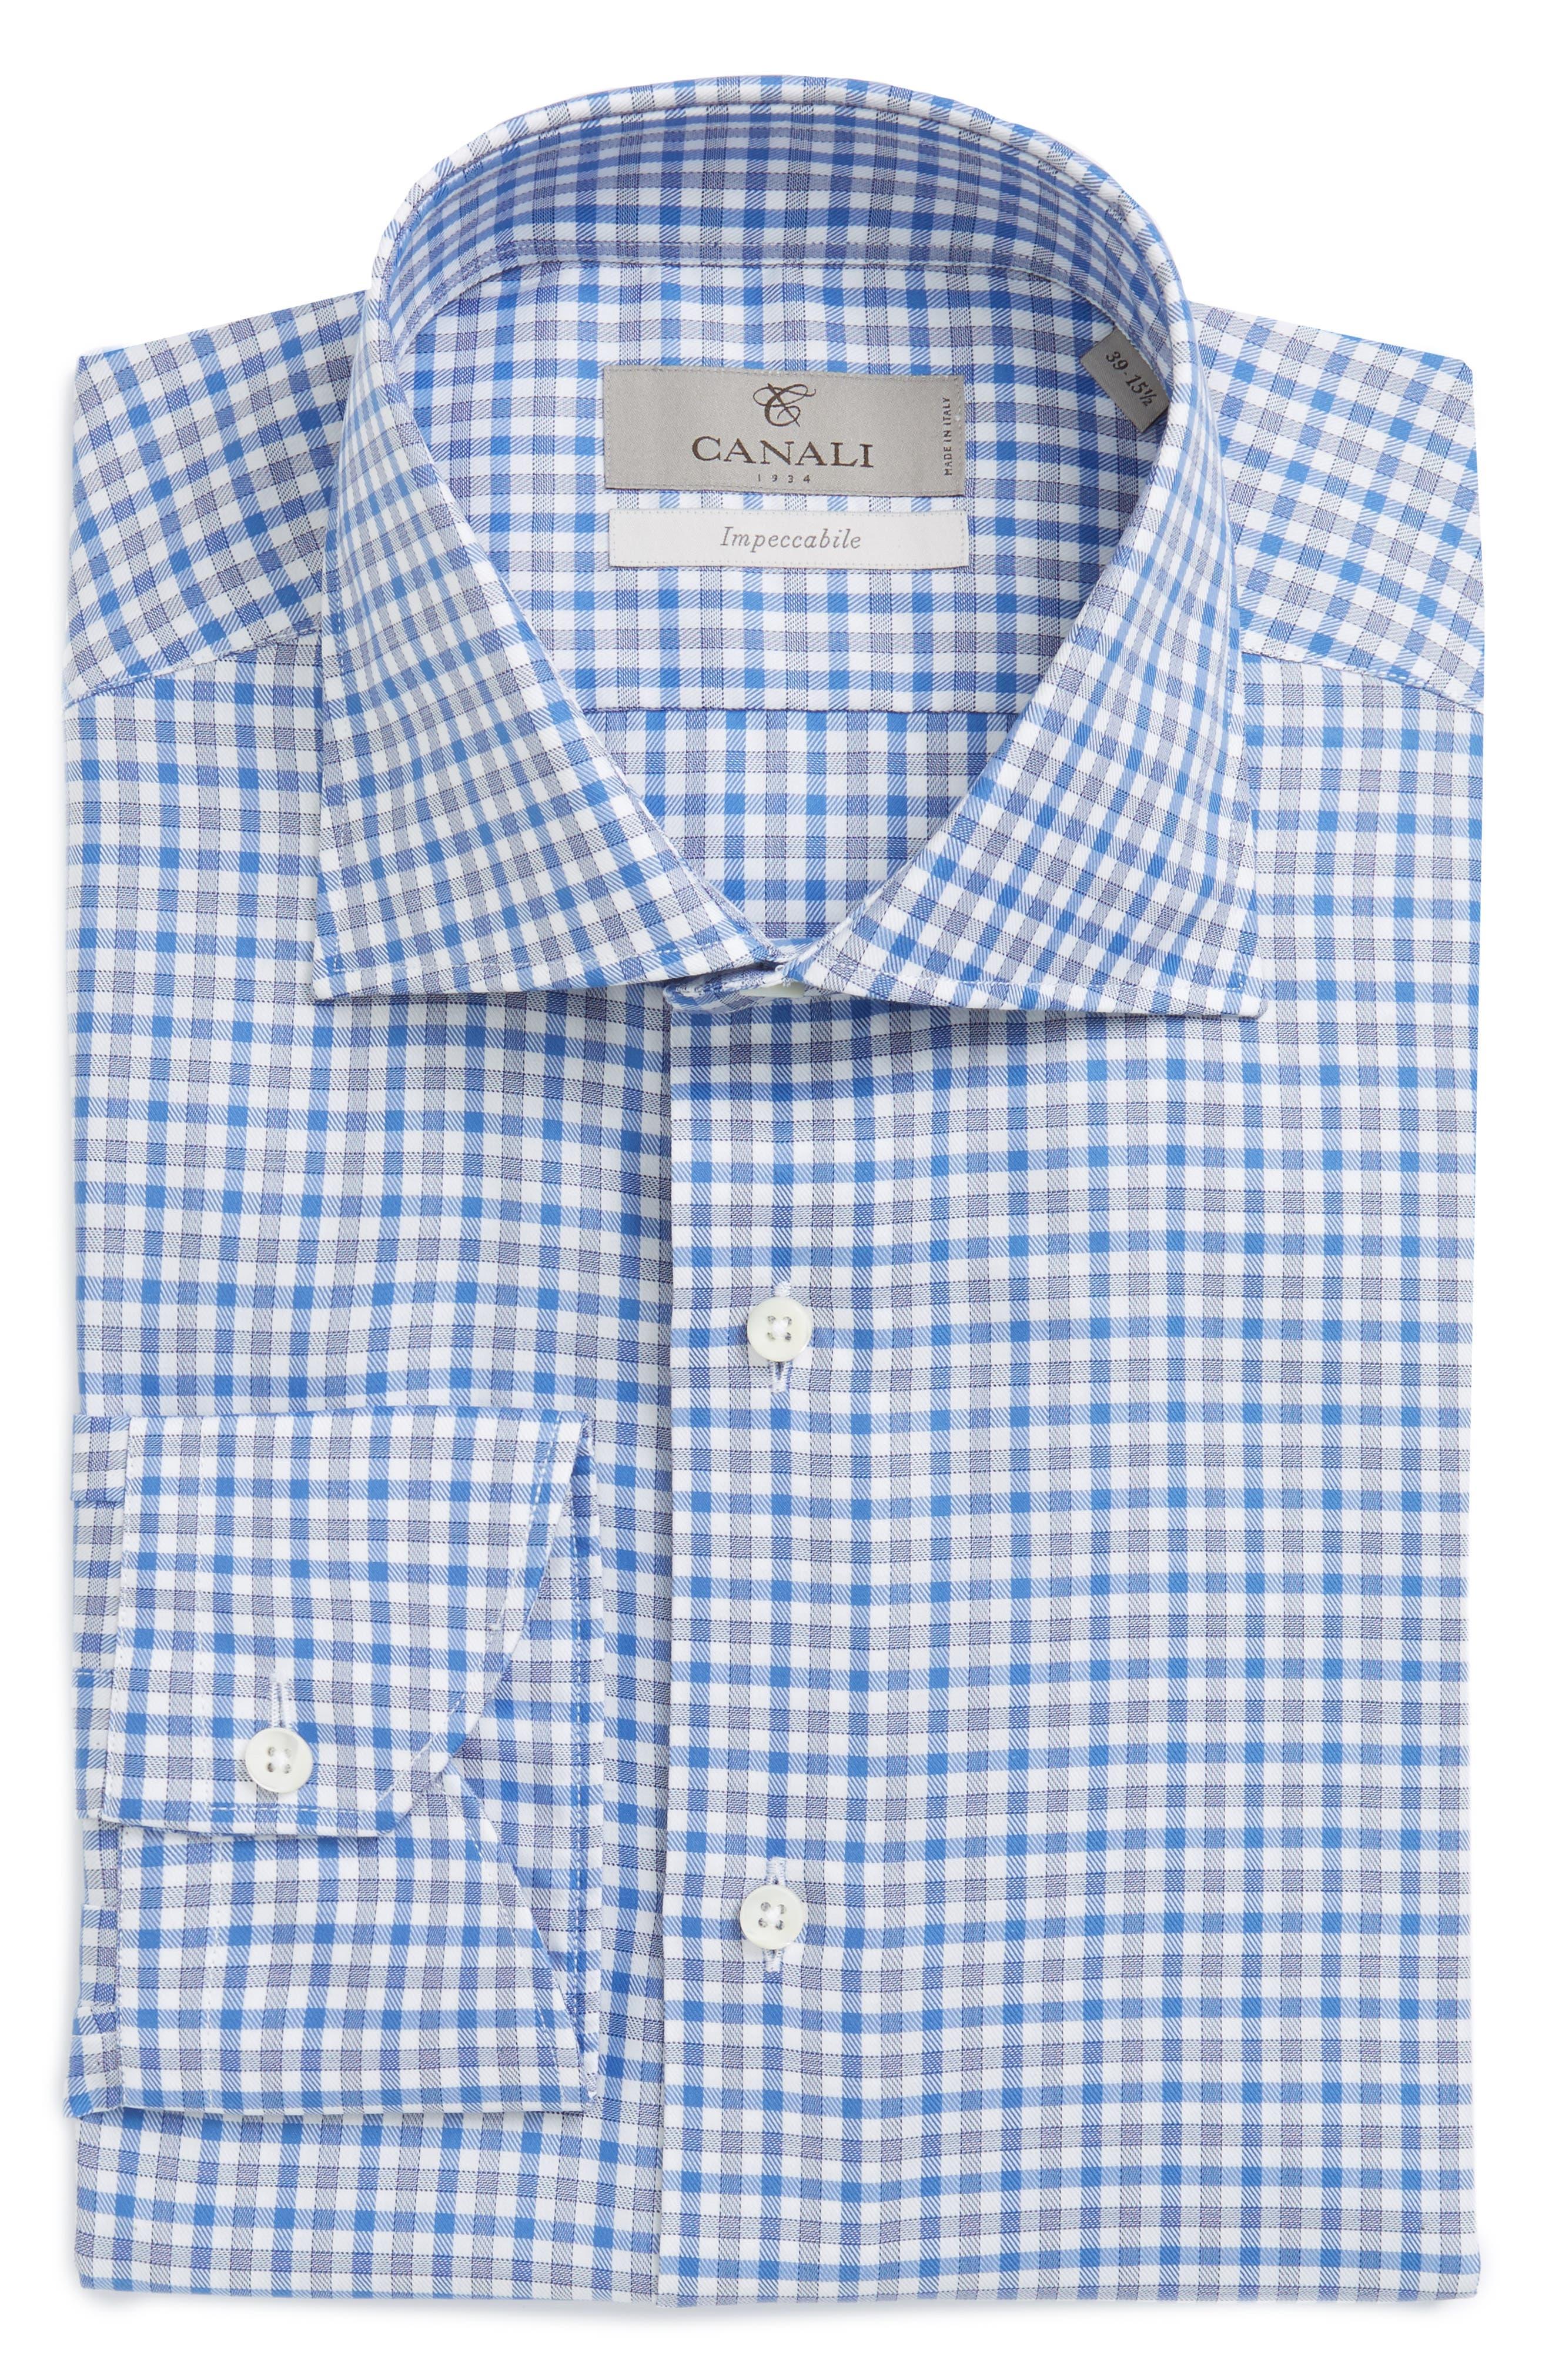 Regular Fit Check Dress Shirt,                         Main,                         color, 420